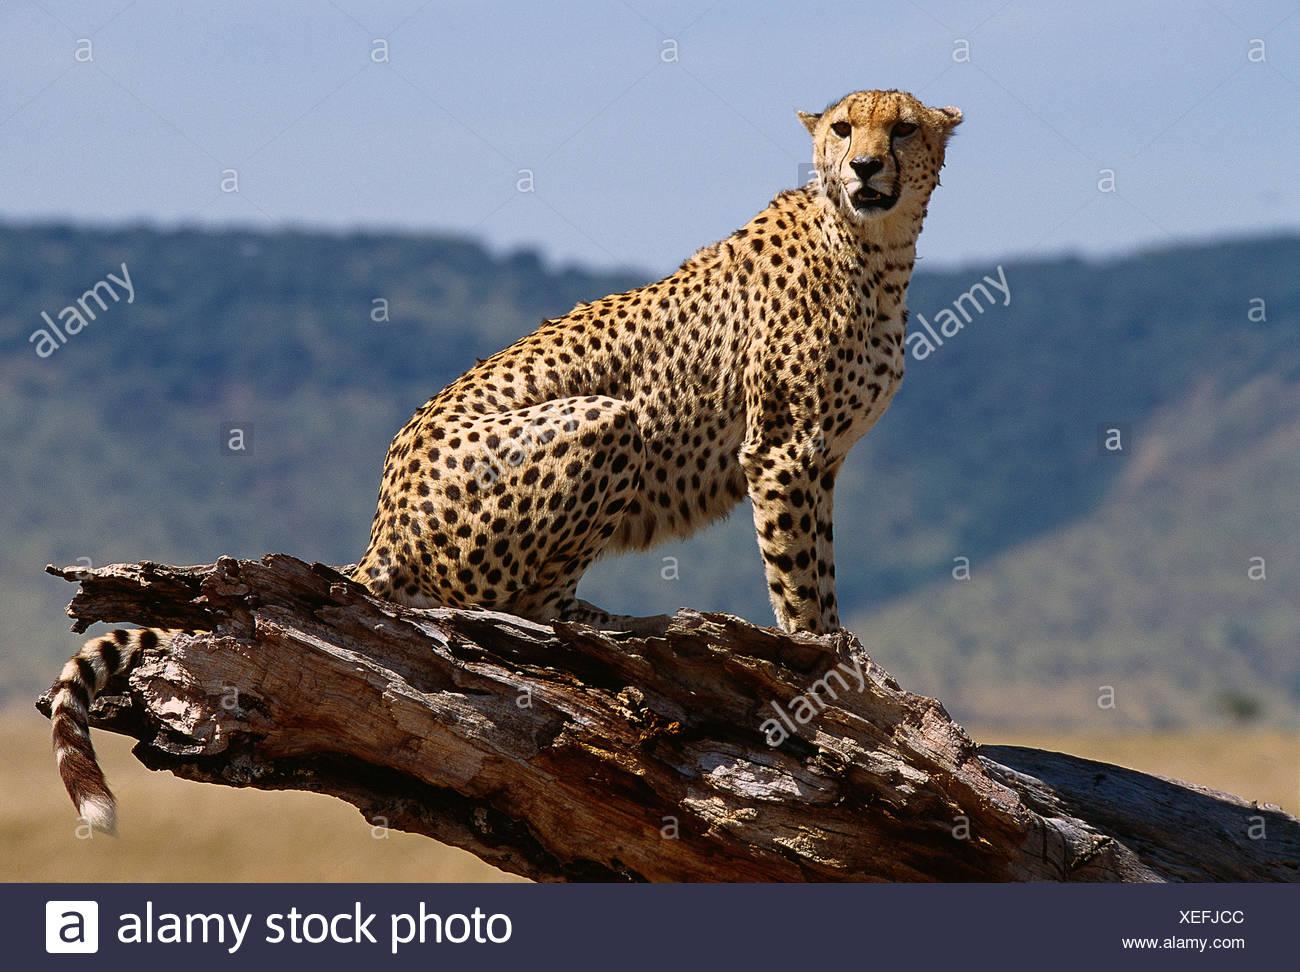 Afrika Kenia Masai Mara National Reserve. Tierwelt. Gepard. Stockbild